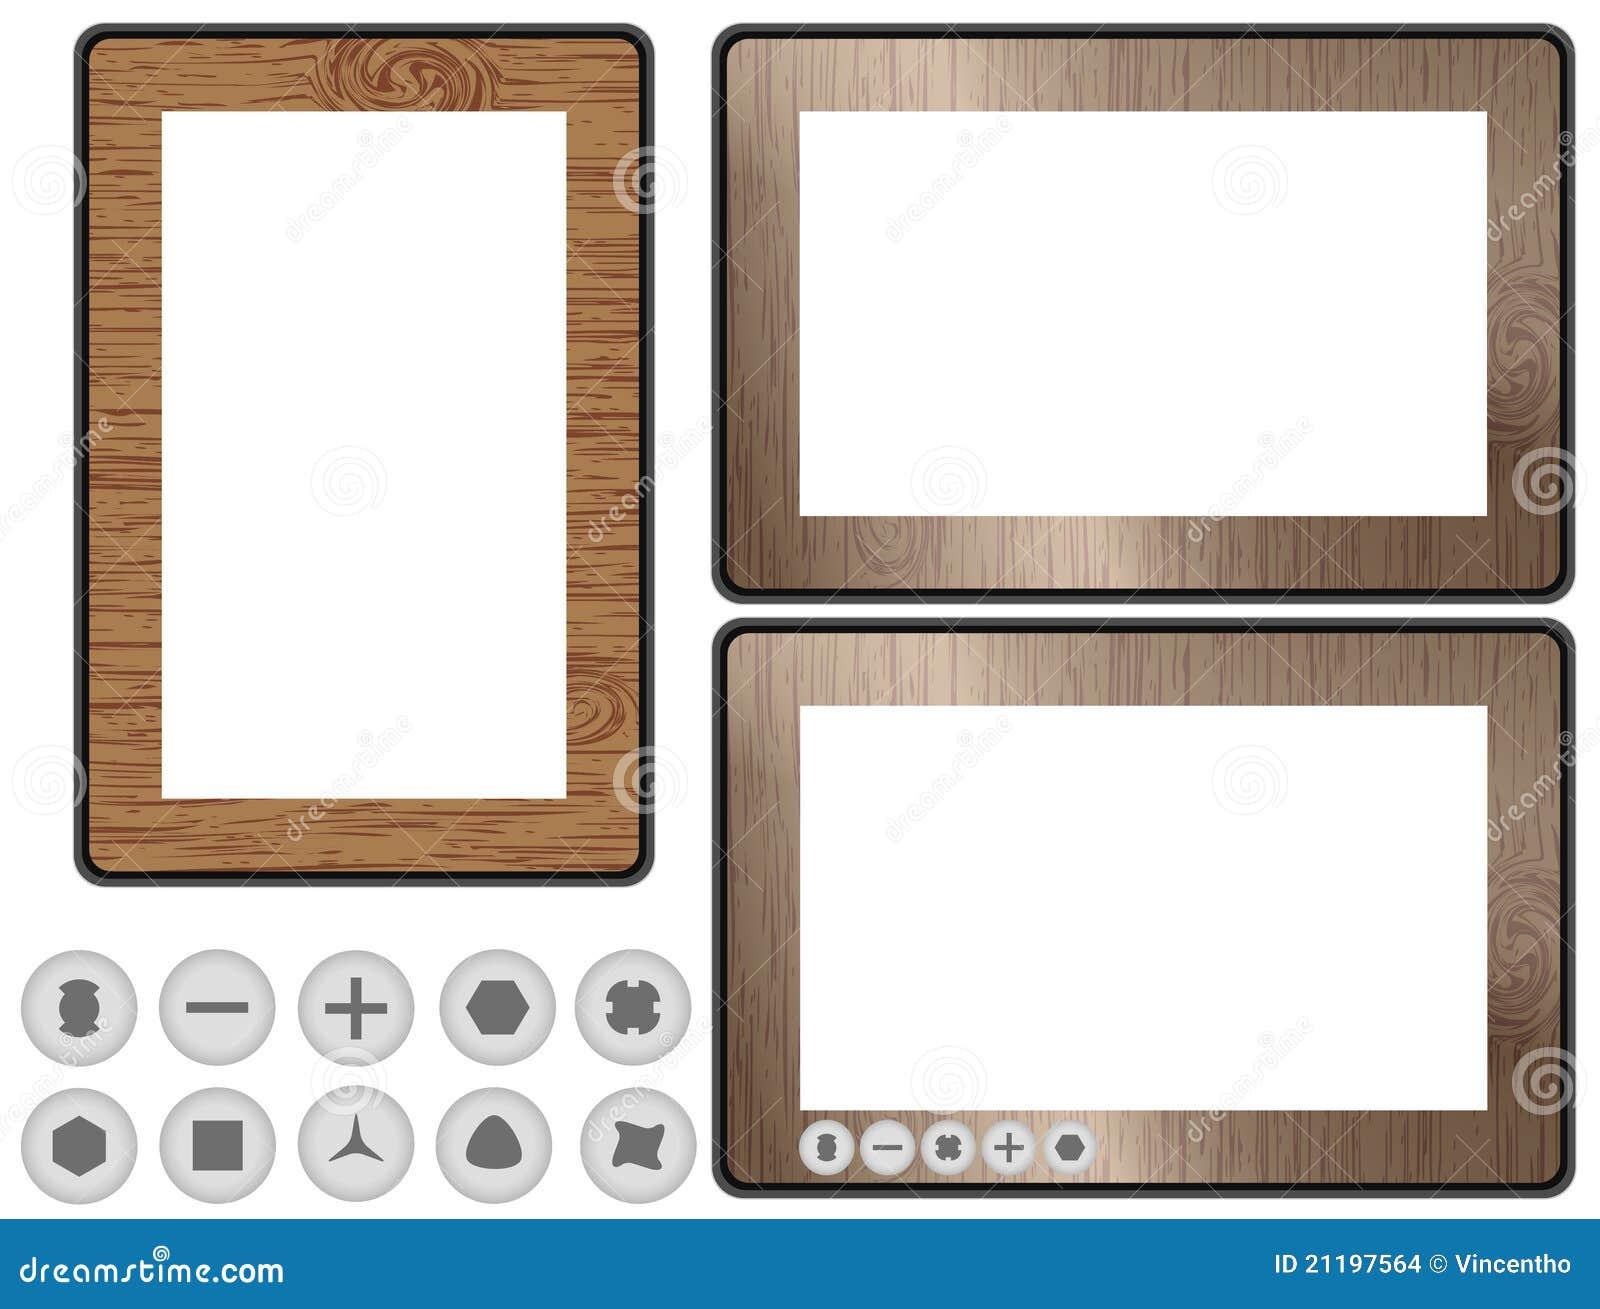 Conceptual Design Wooden Tablet PC Illustration